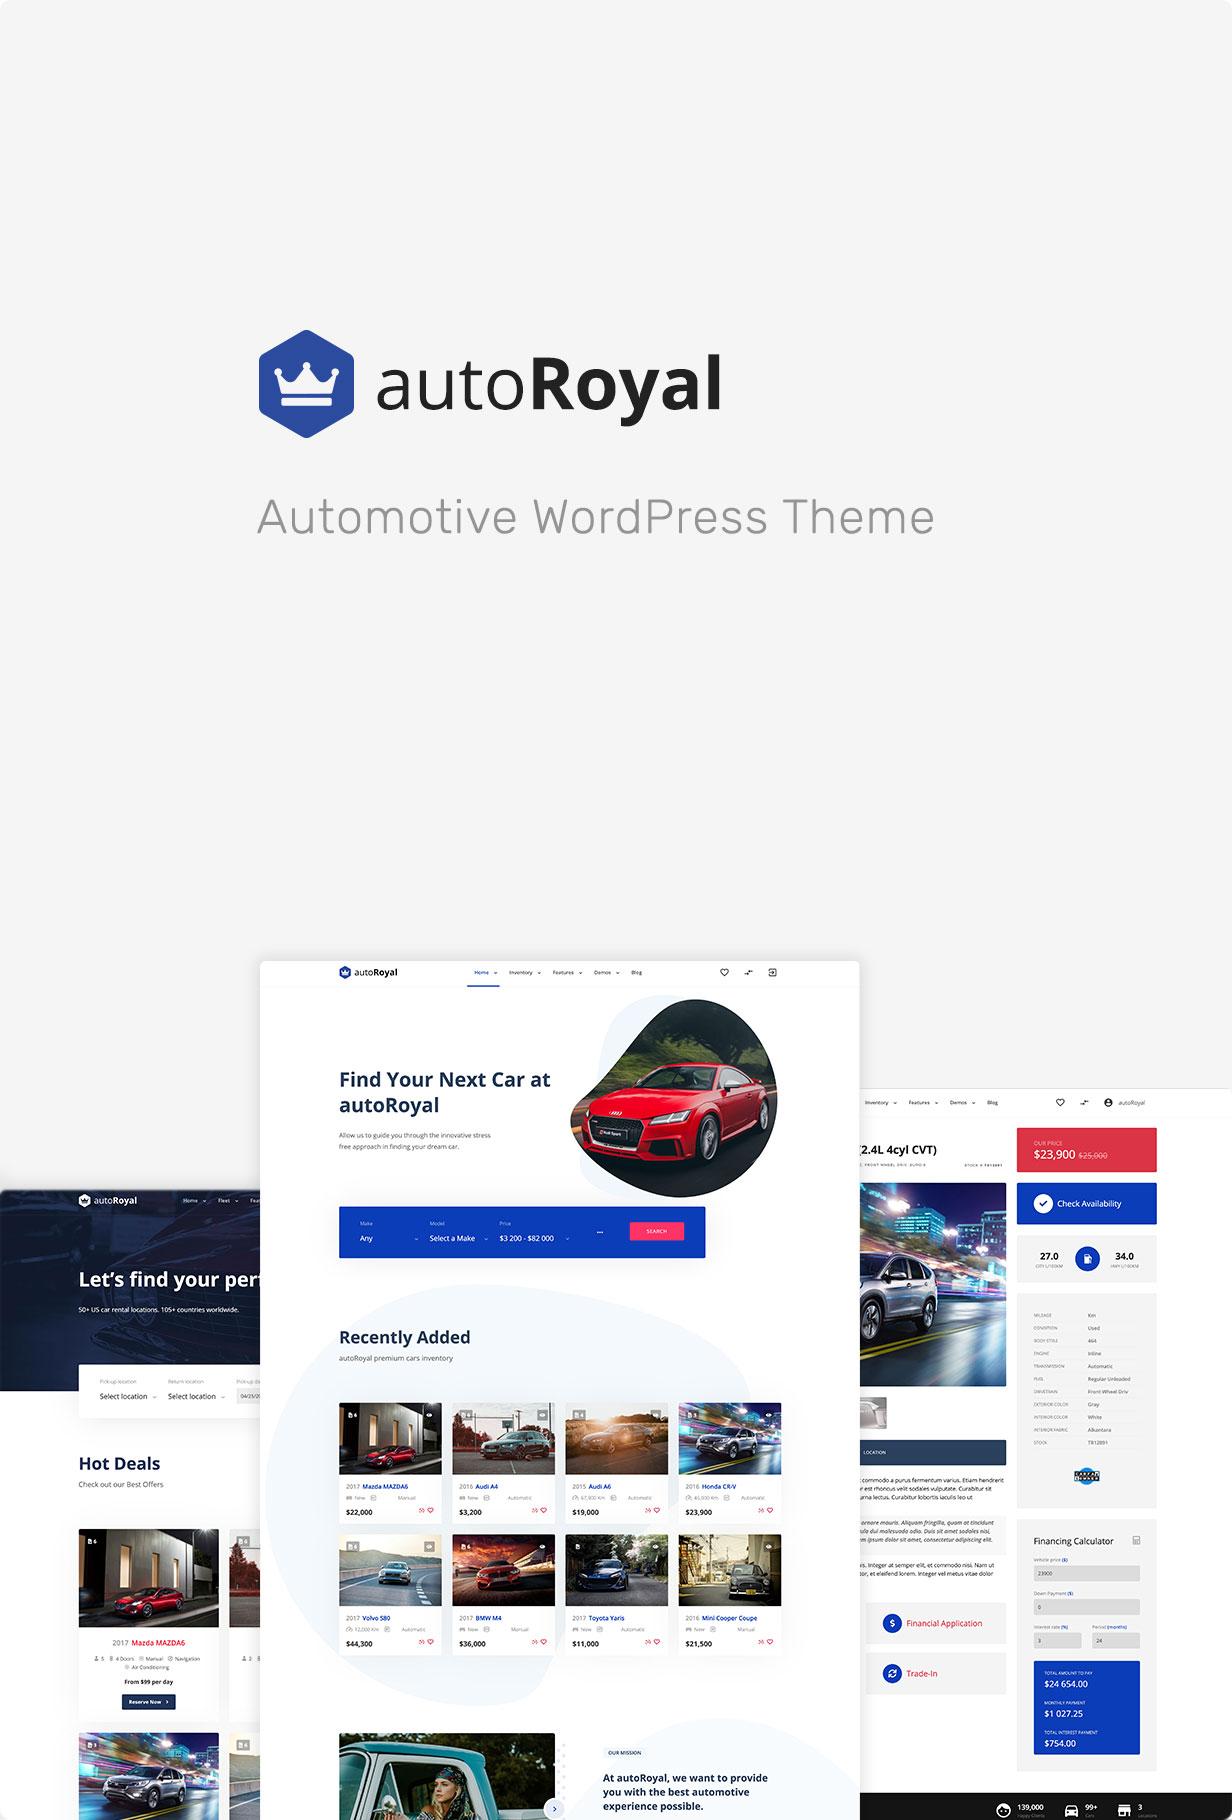 autoRoyal - Automotive WordPress Theme - 3